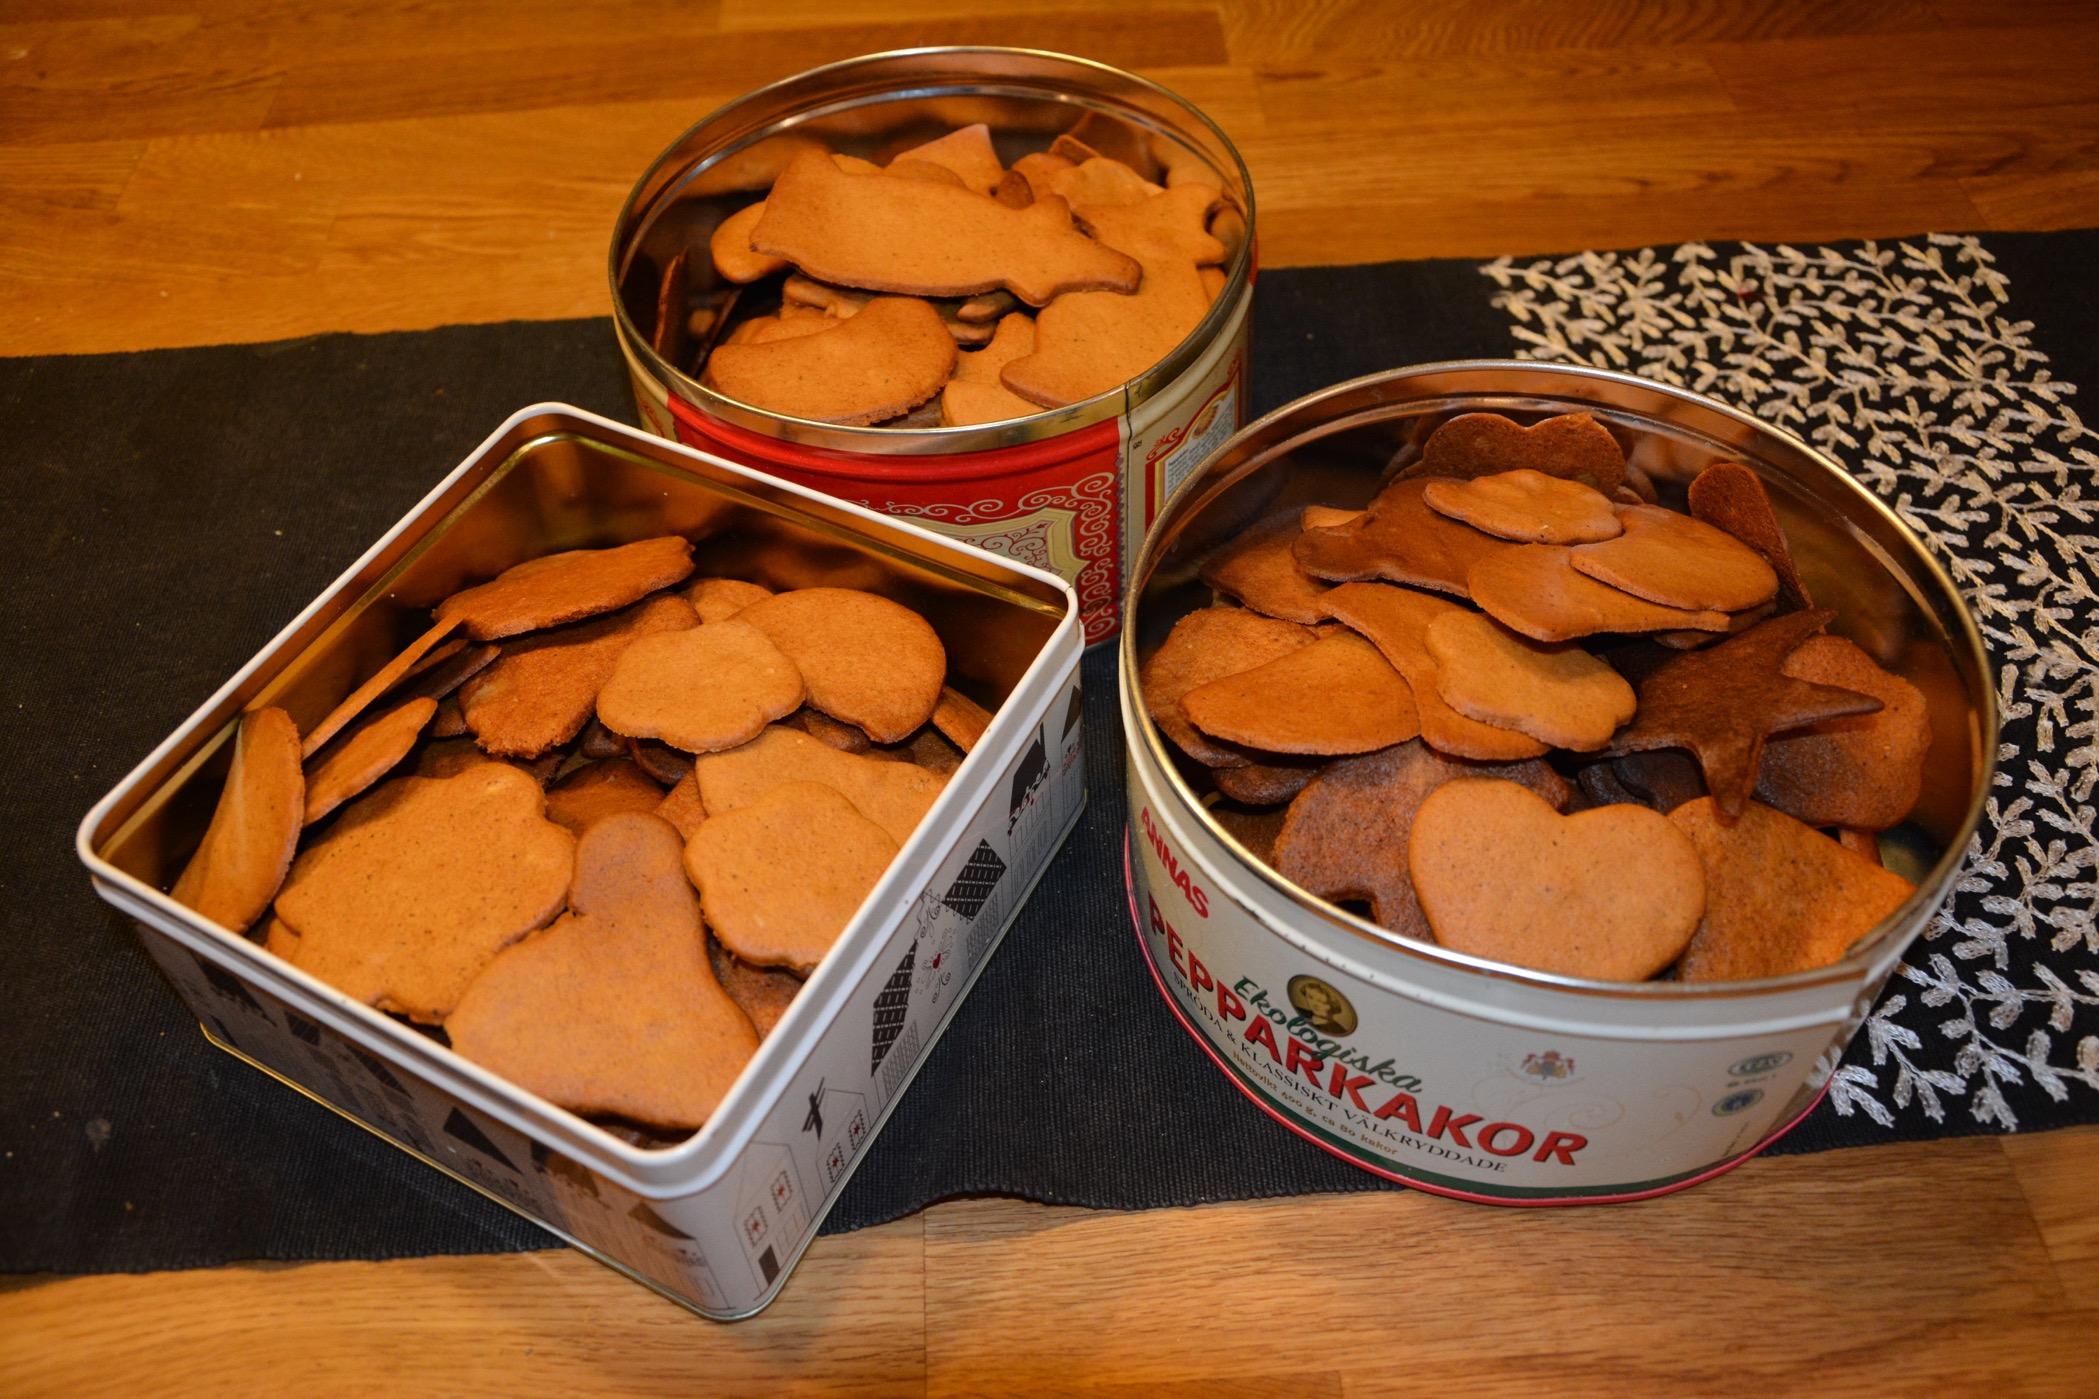 Tre stora burkar med kakor blev resultatet.